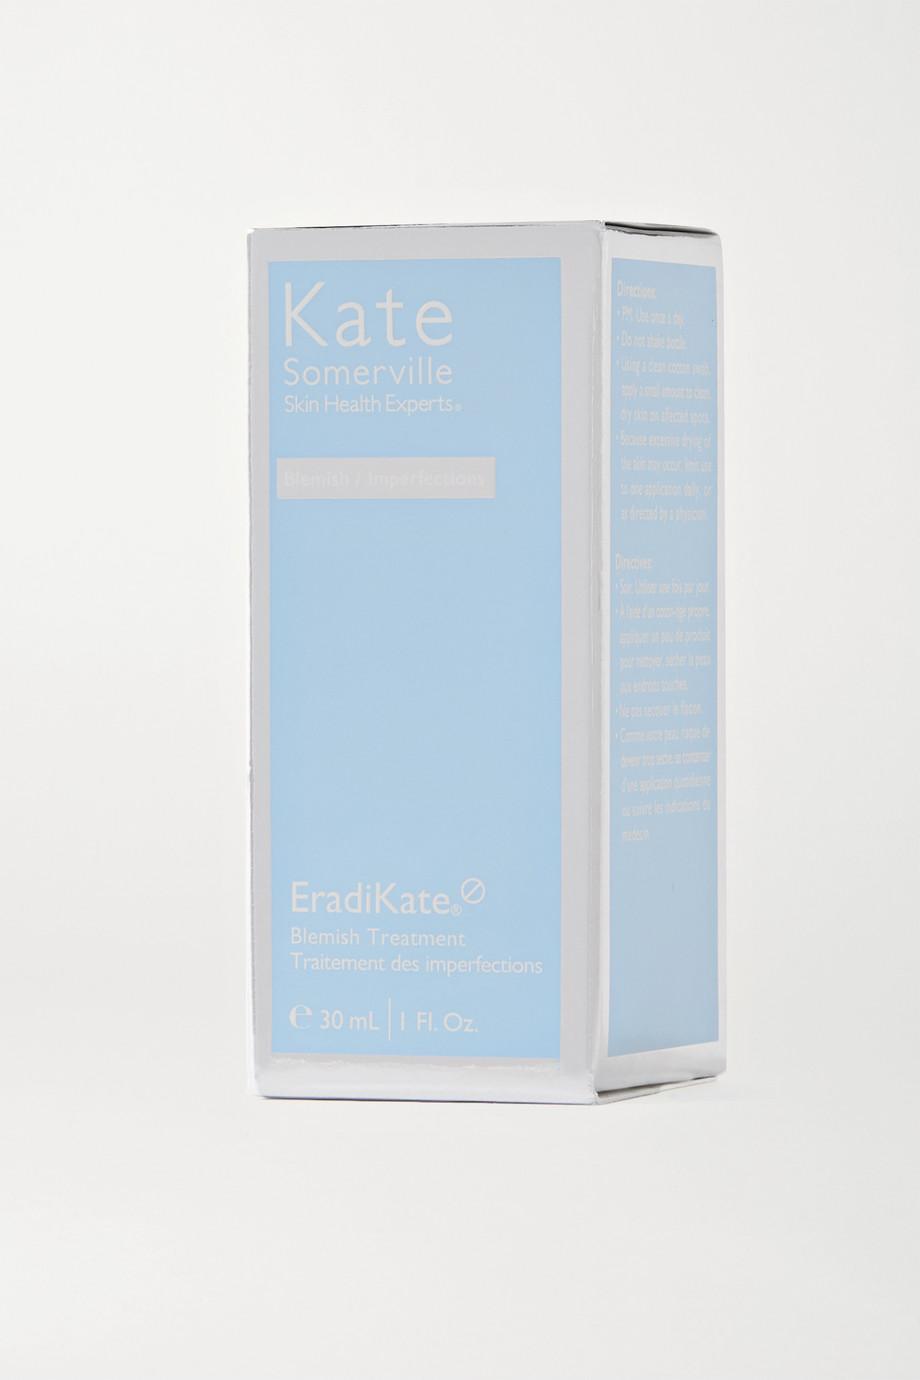 Kate Somerville EradiKate Salicylic Acid Blemish Spot Treatment, 30ml